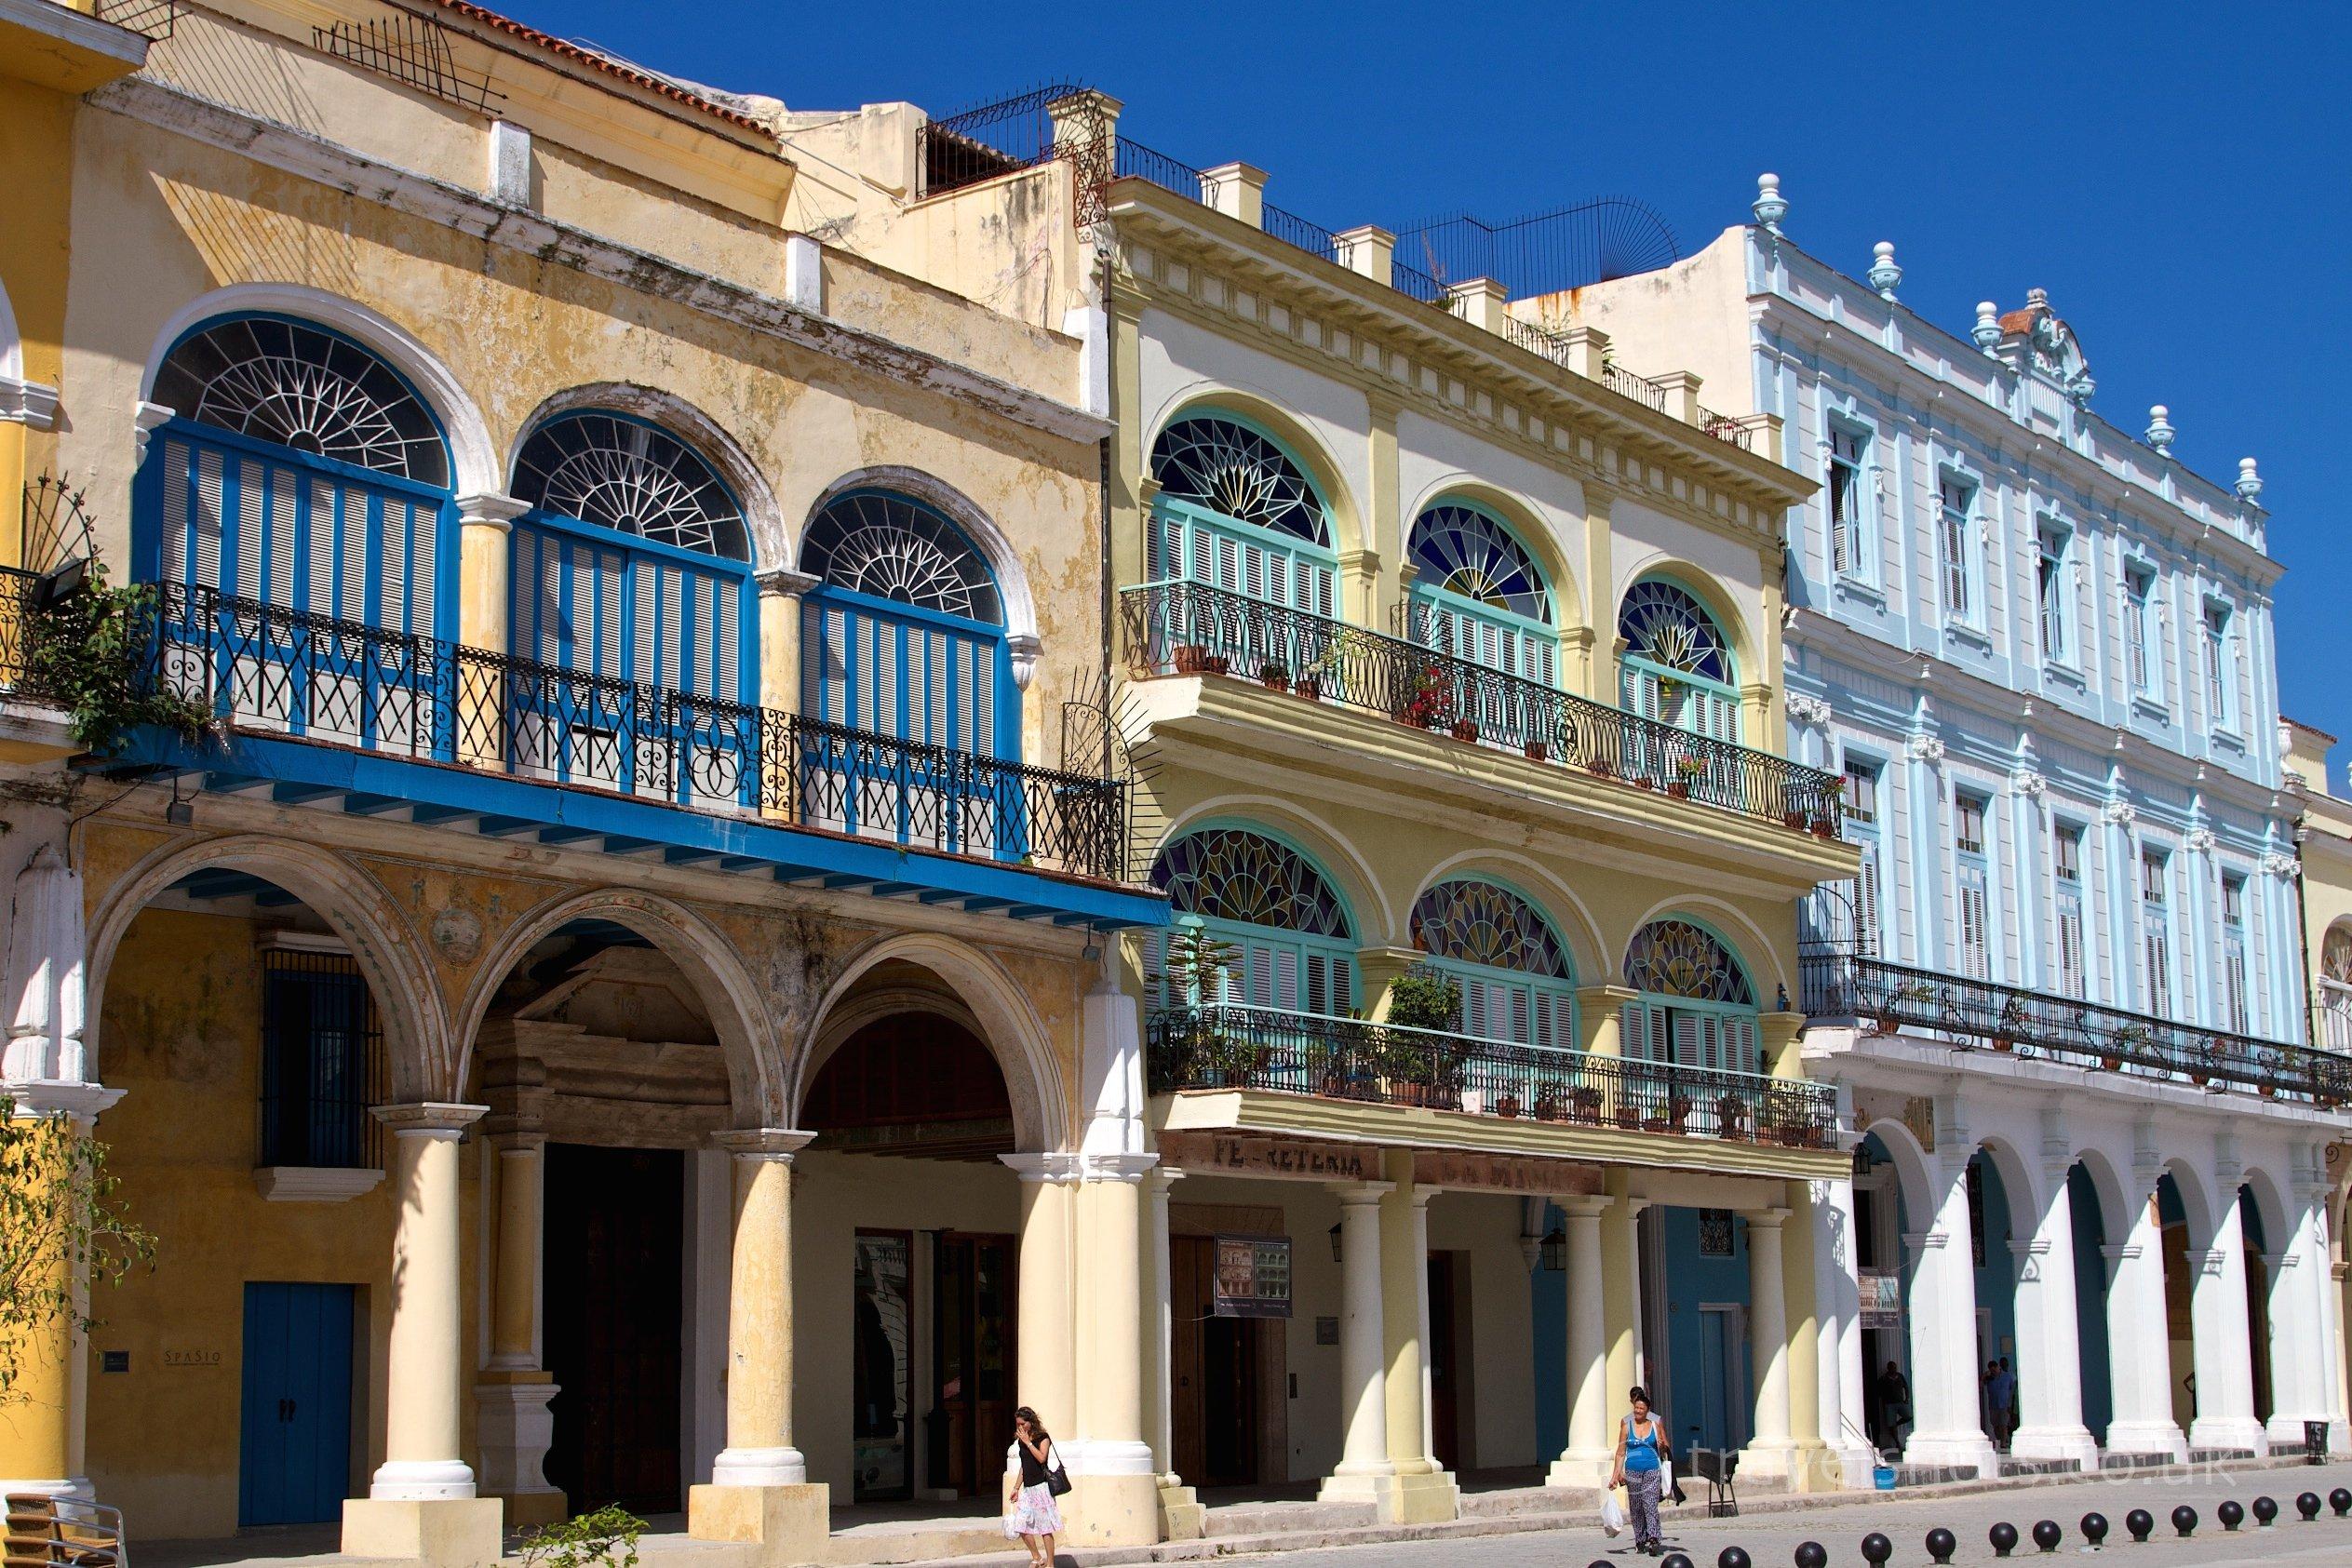 Plaza-Vieja-Old-Havana-Cuba-8